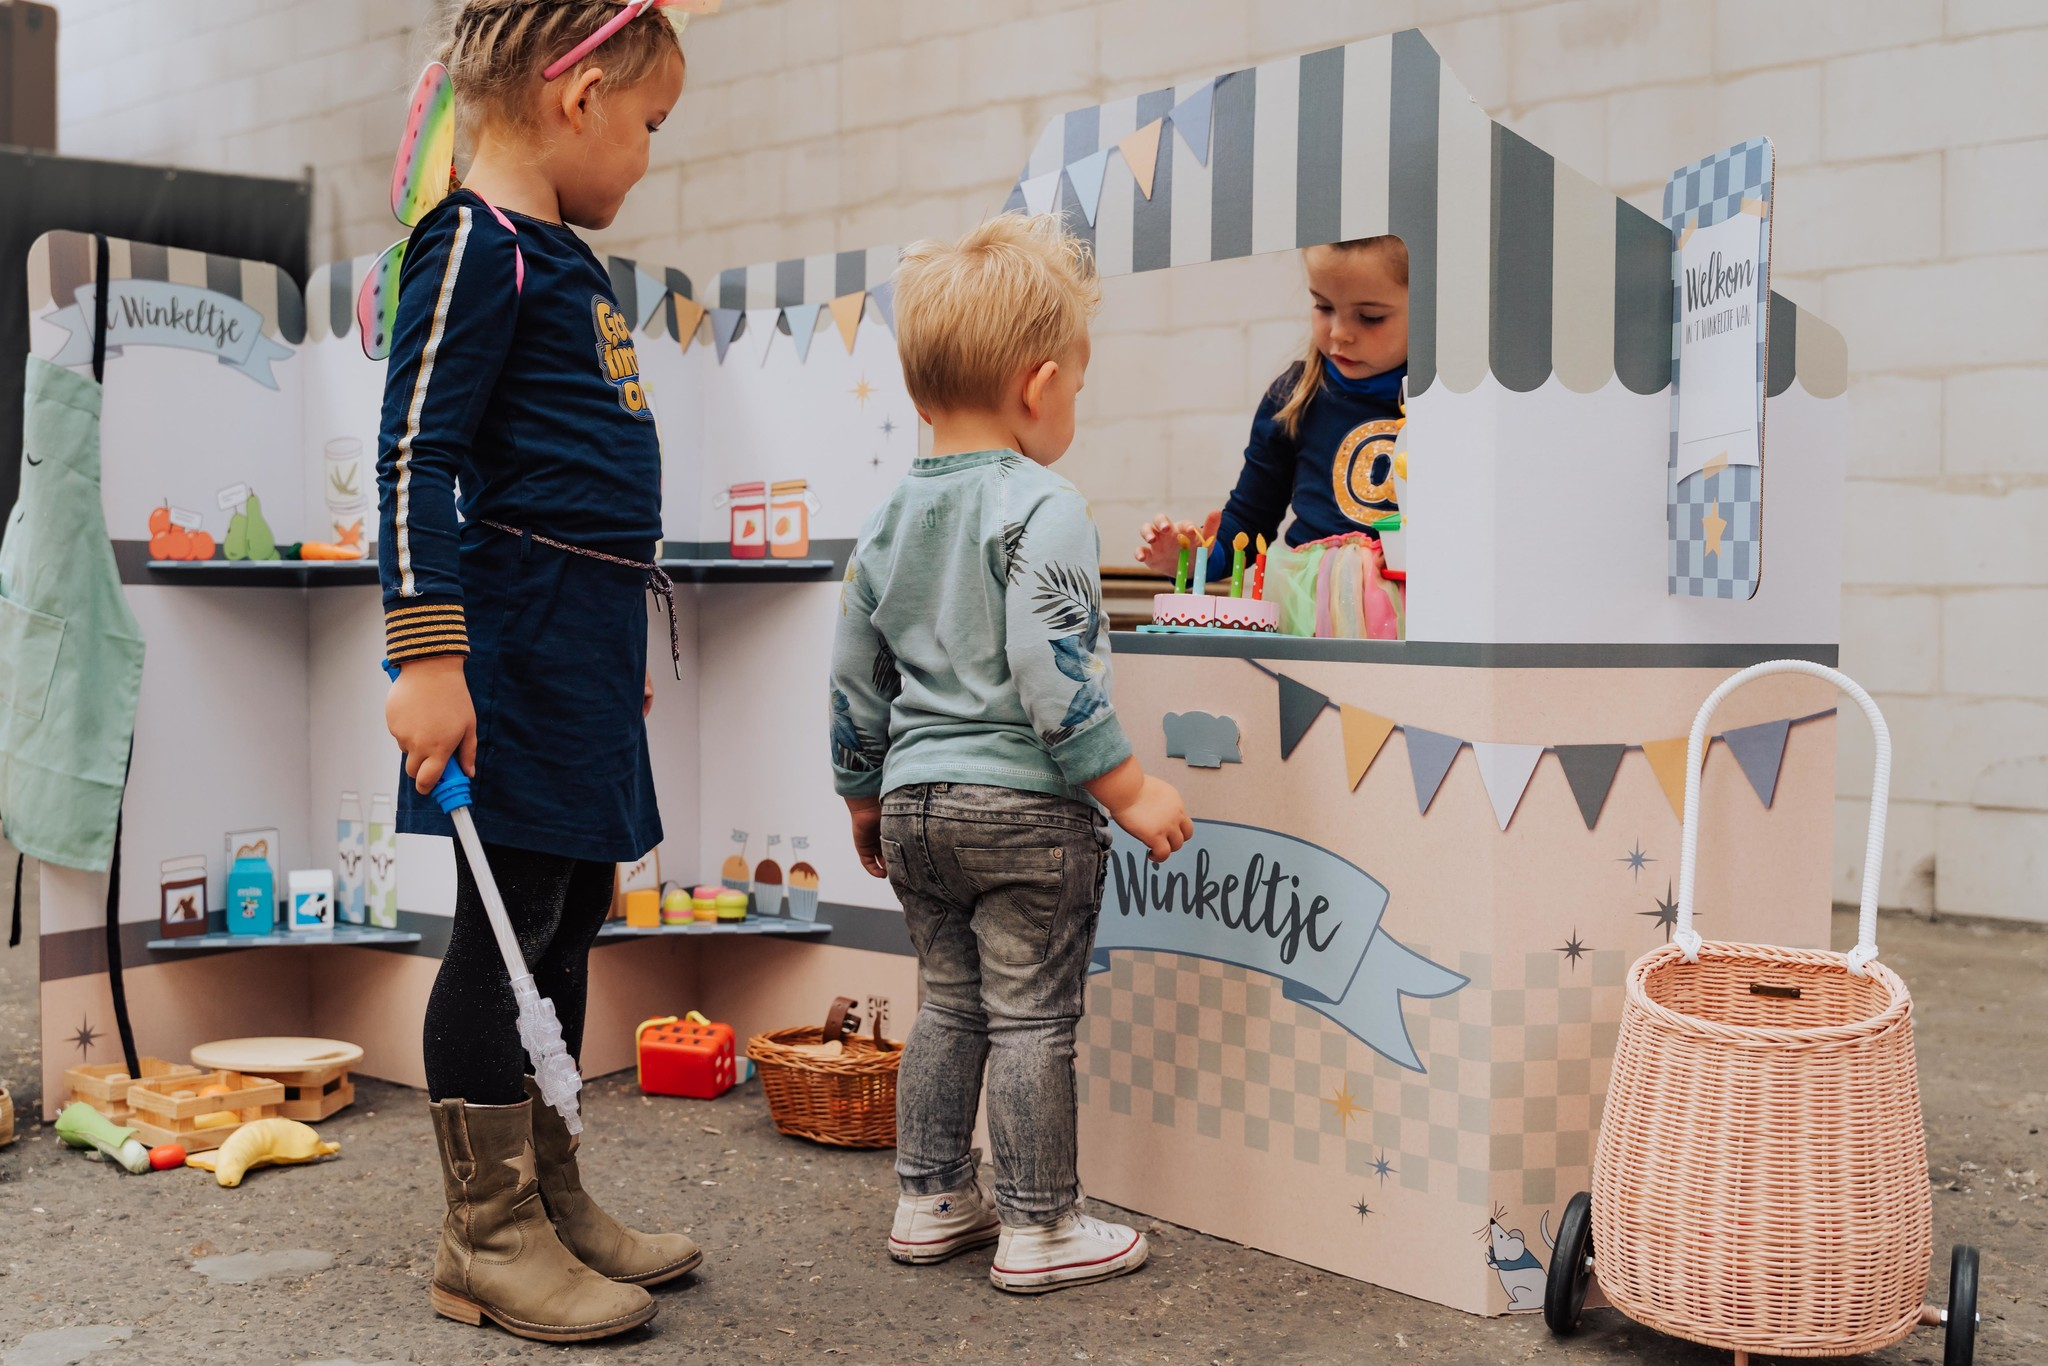 EVE kids Winkeltje blauw